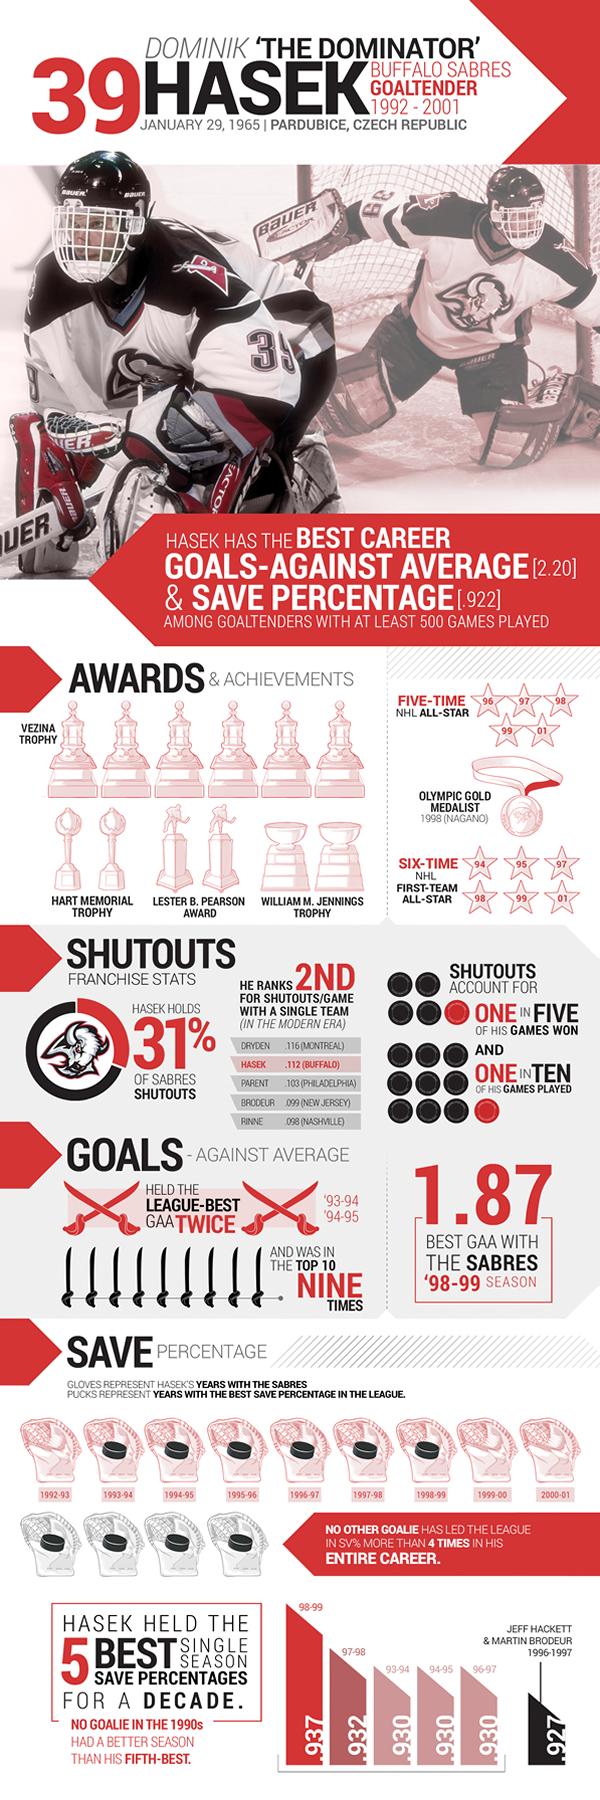 hasek-hof-infographic